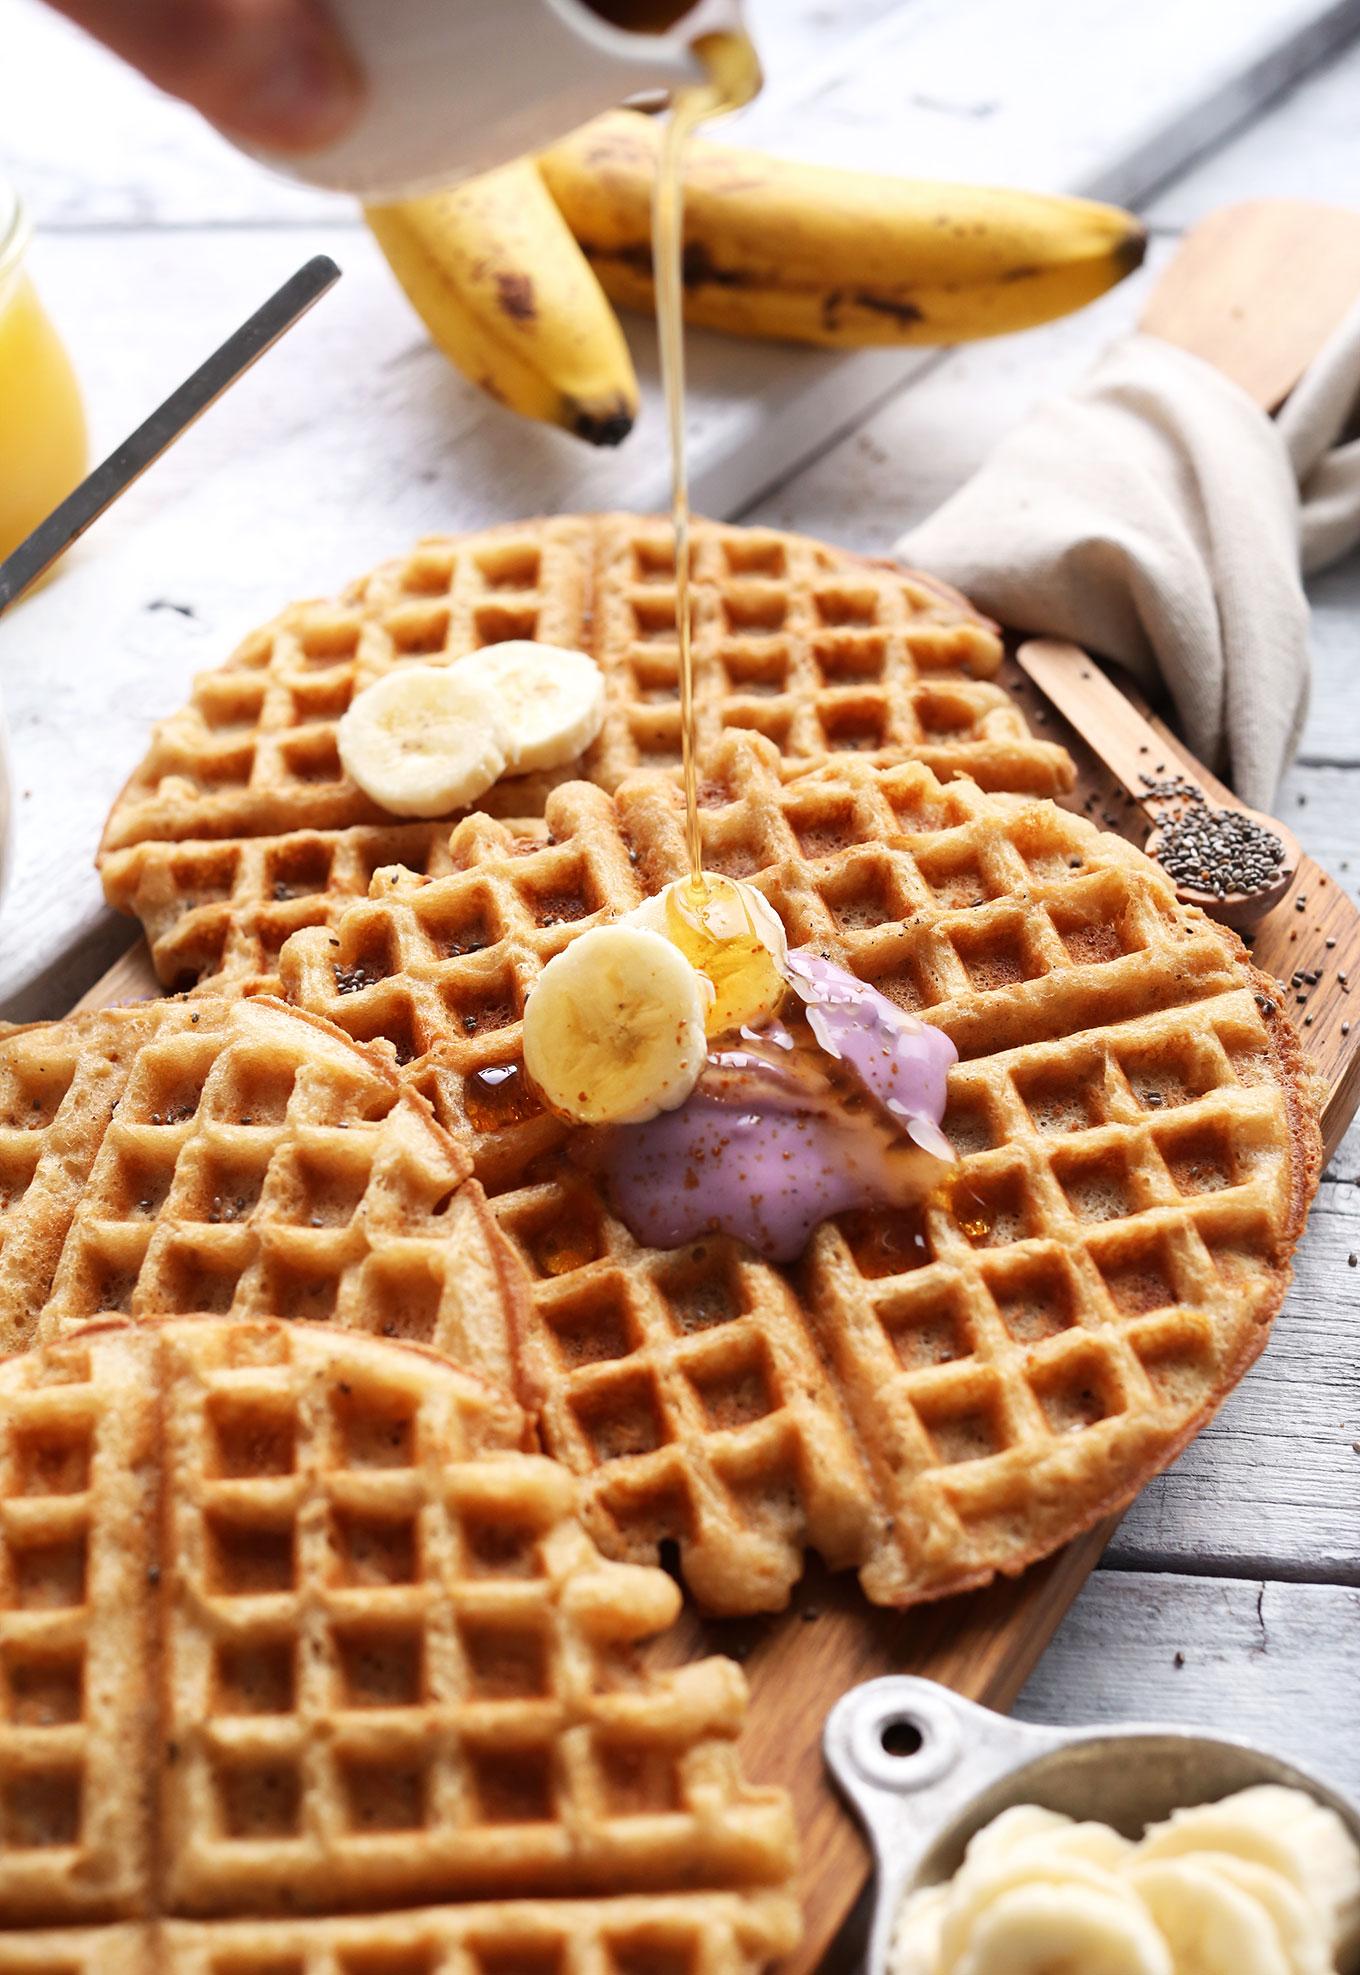 Pouring syrup onto a Vegan GF Yogurt Waffle